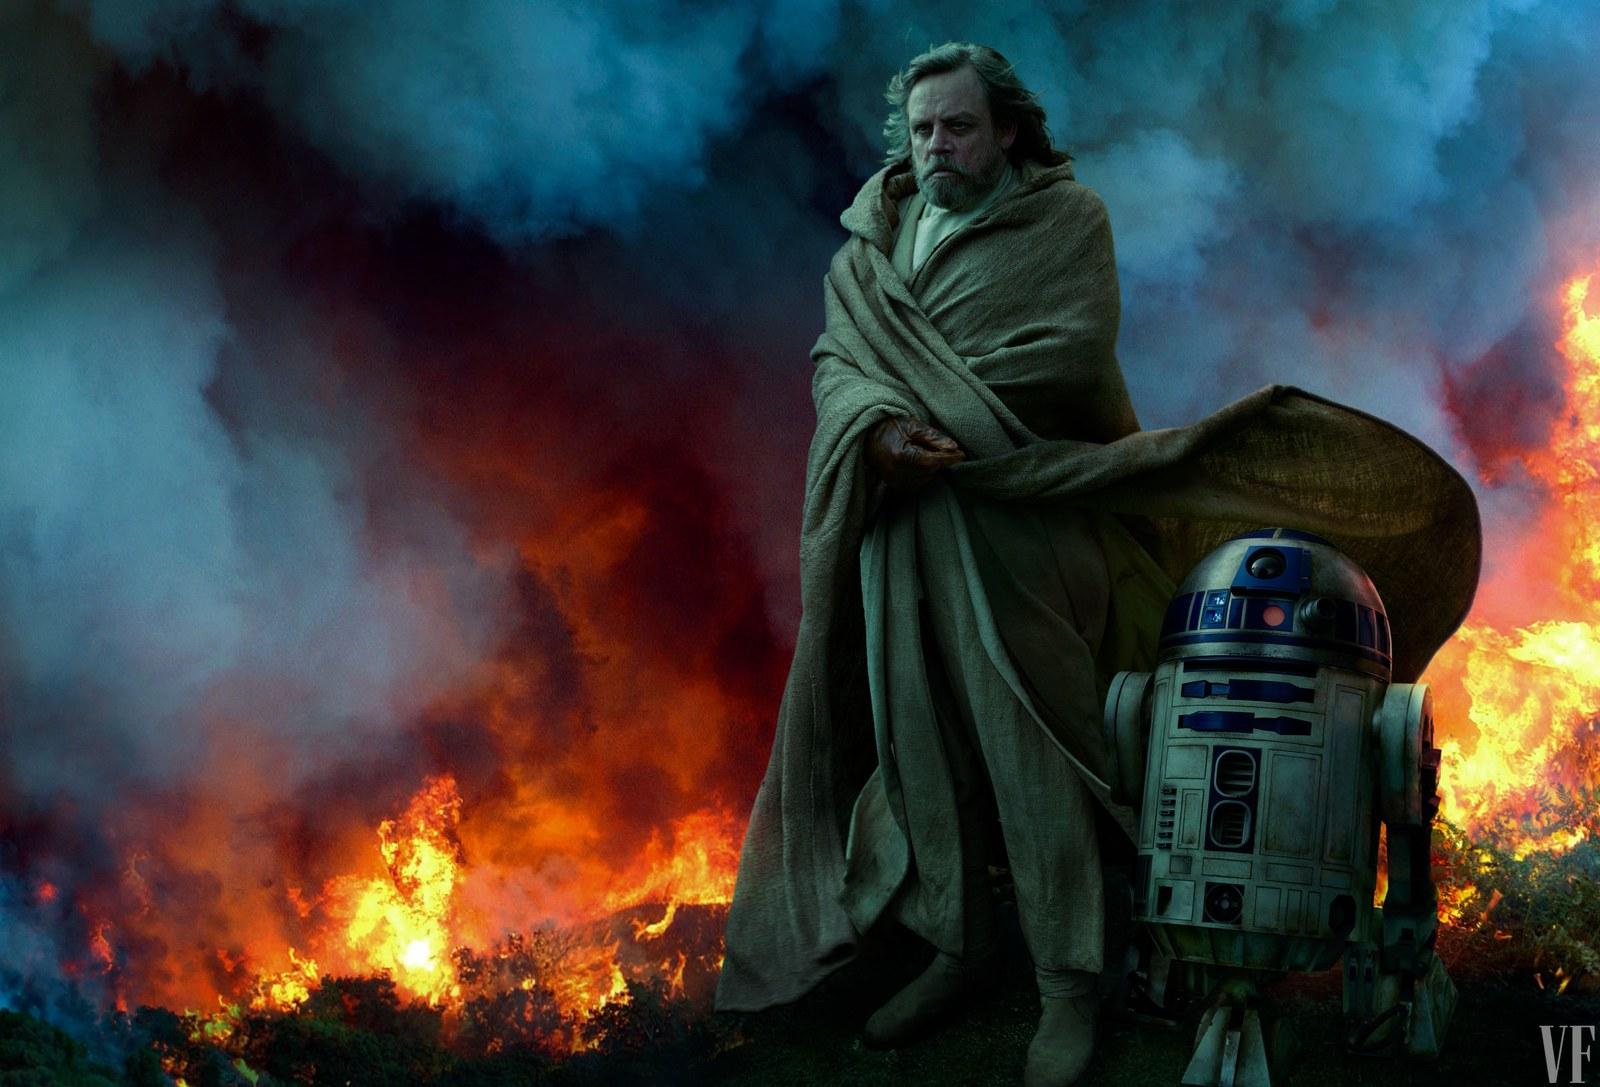 Star Wars - Episode IX - Rise of Skywalker - Page 8 7l87gX